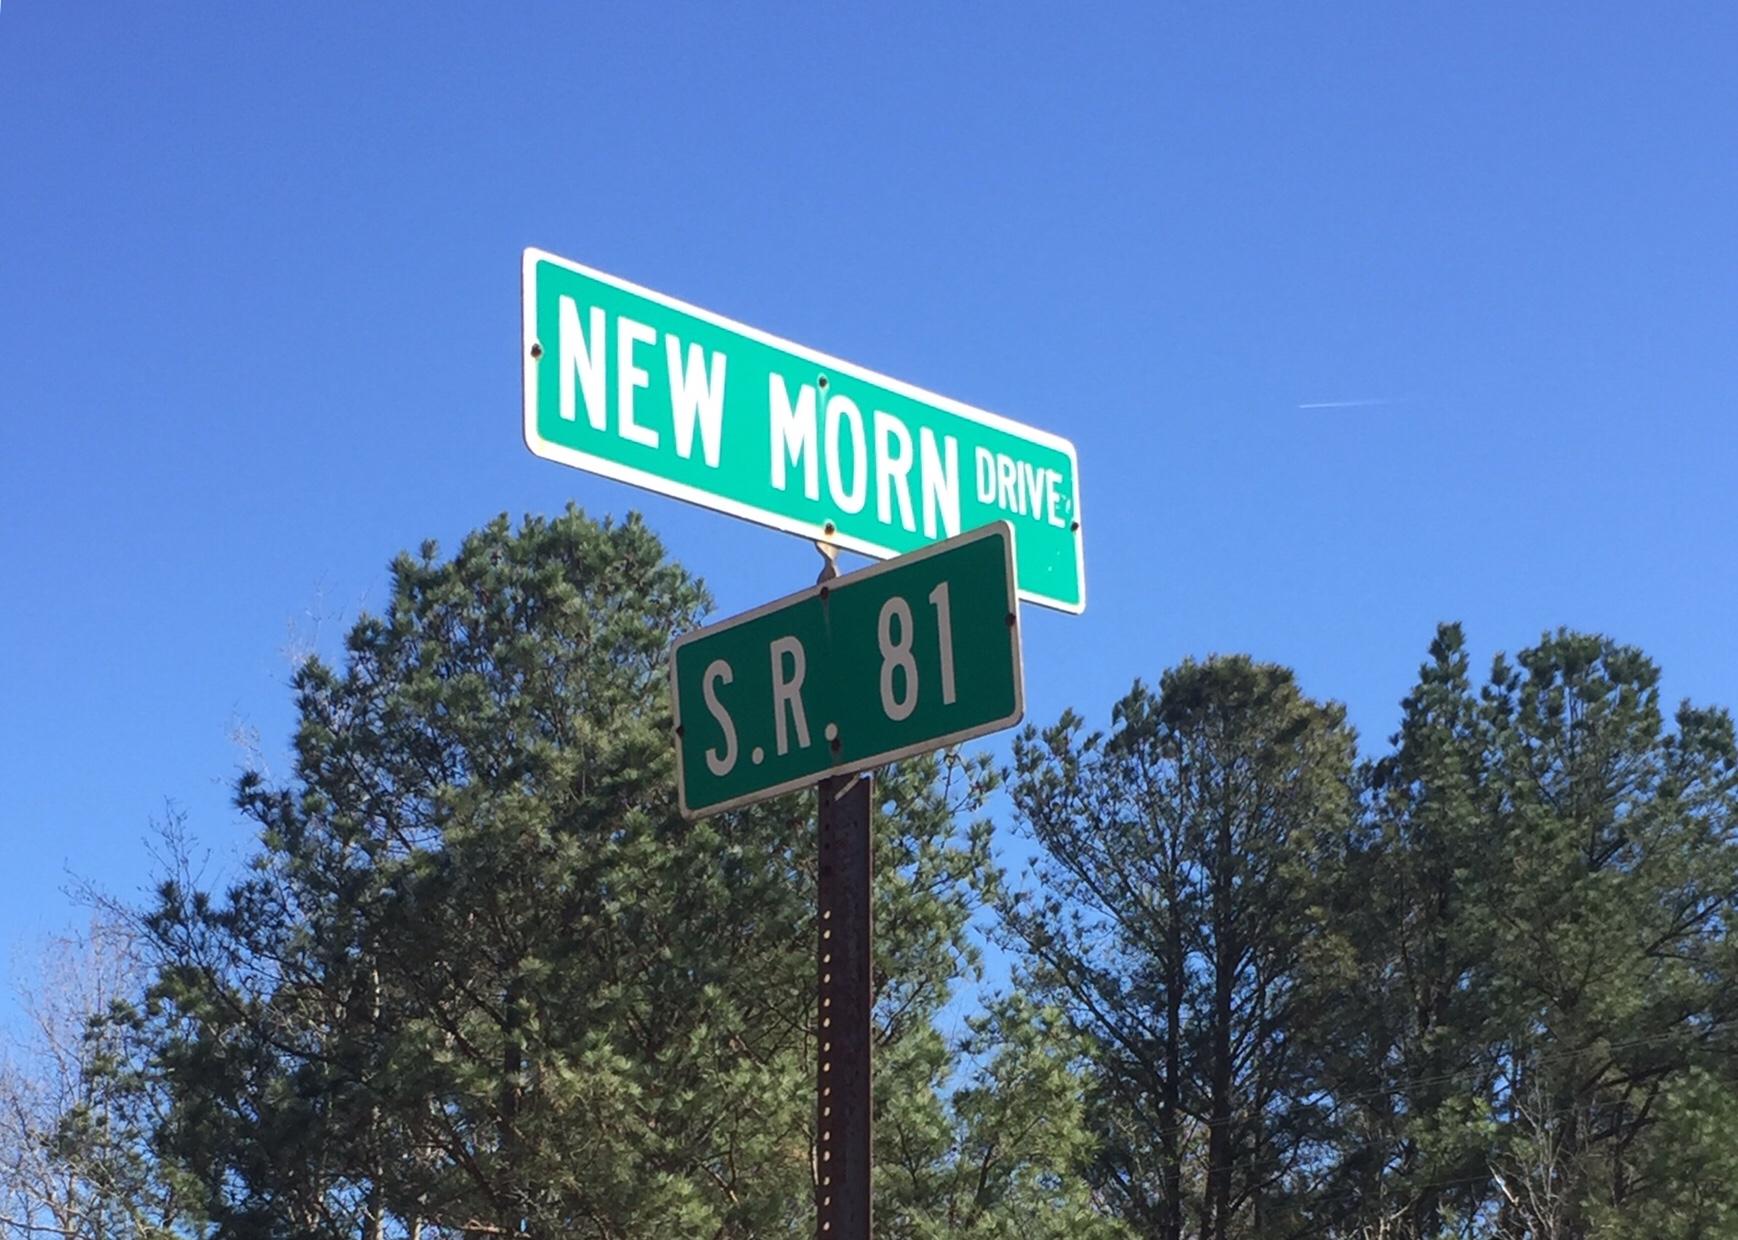 New Morn Drive at SR 81